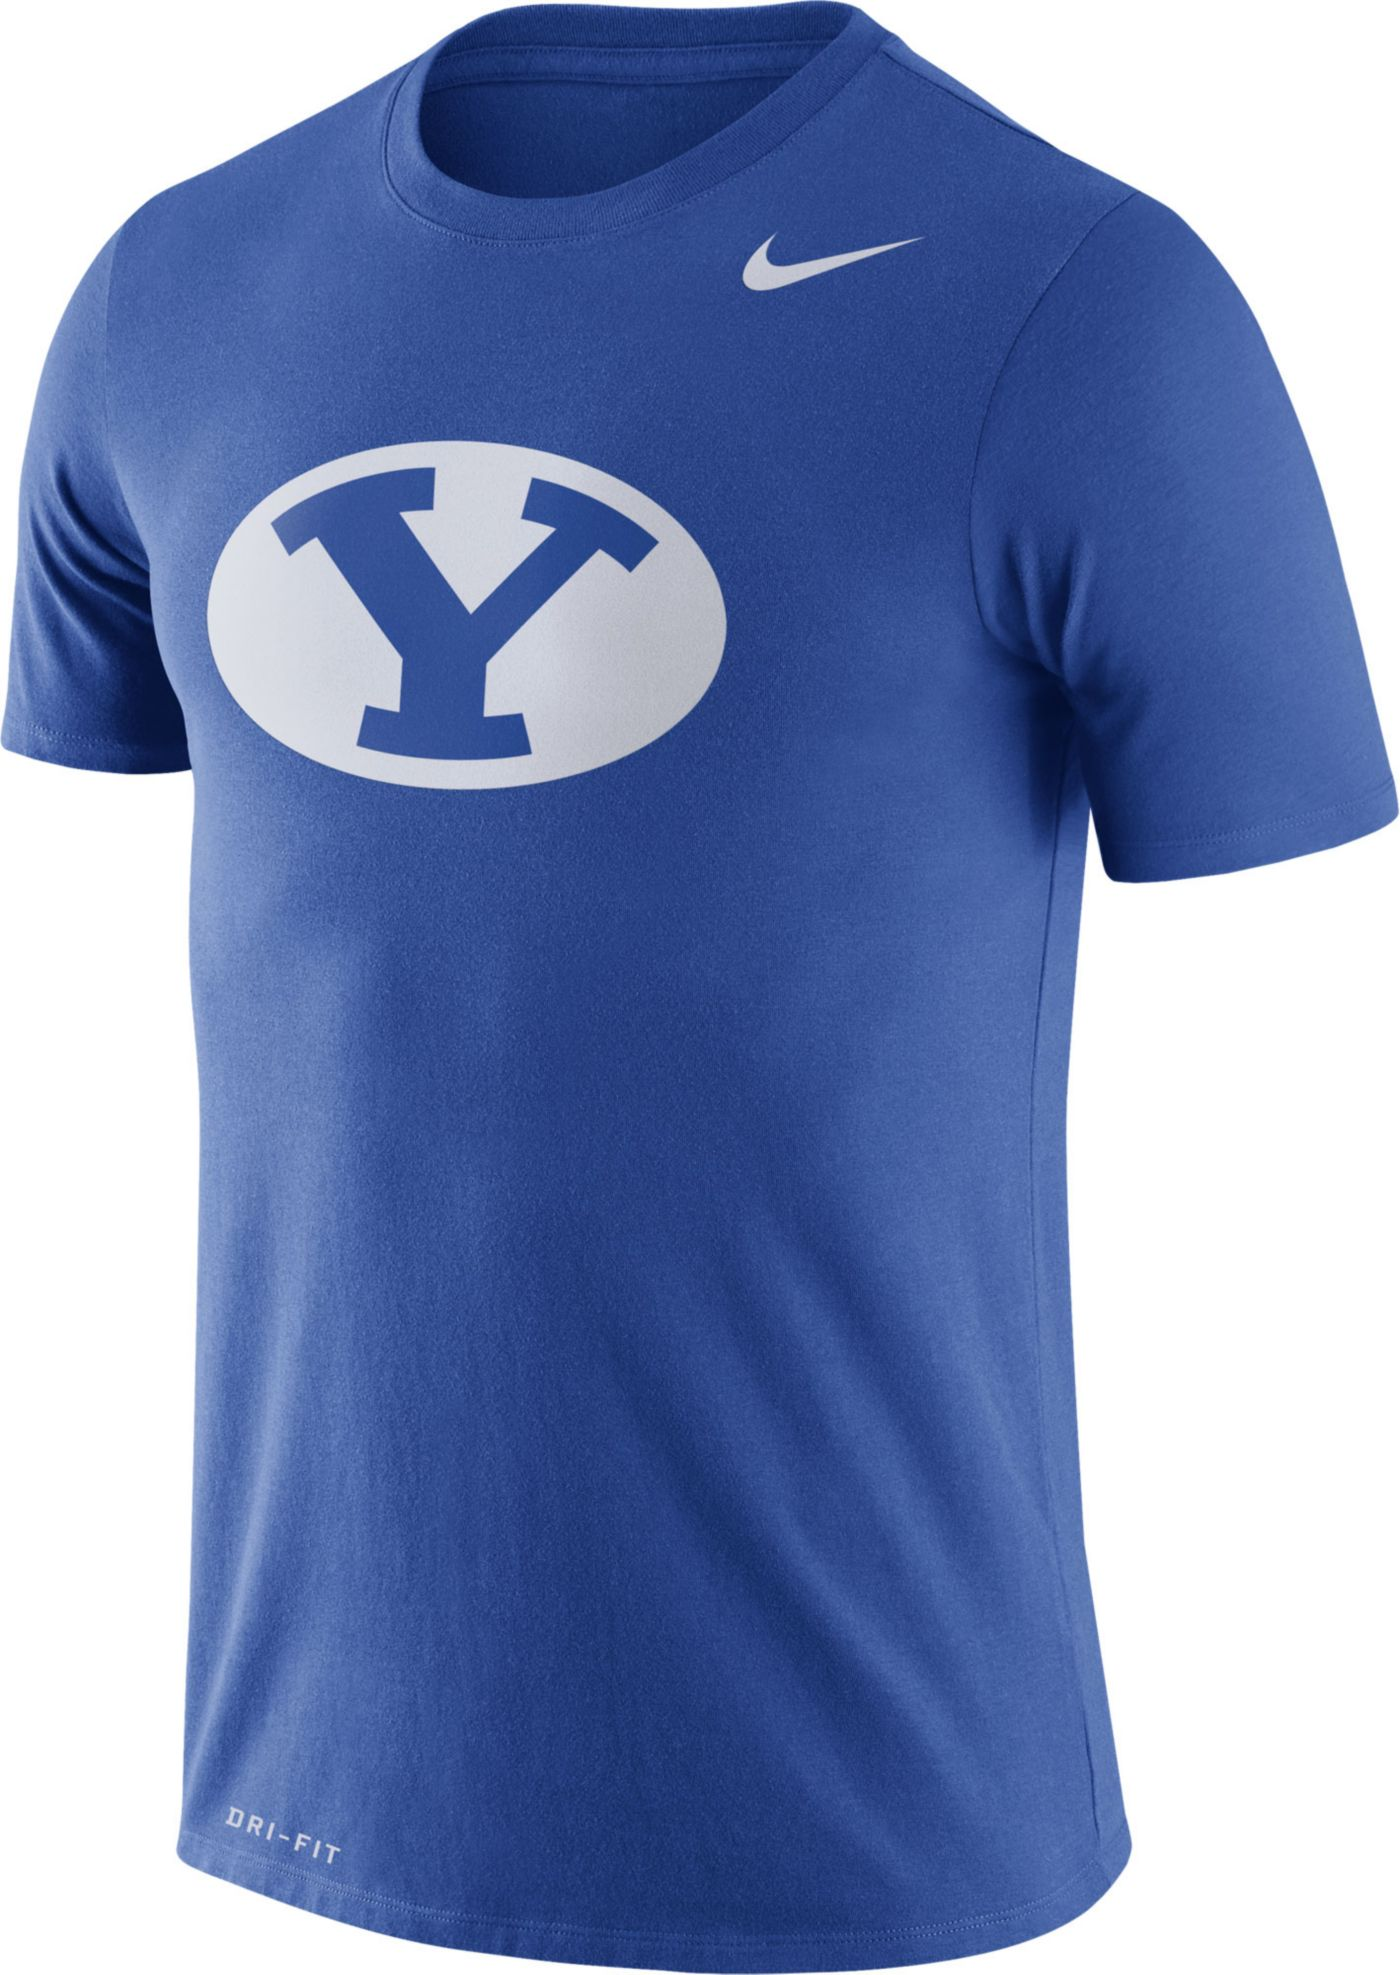 Nike Men's BYU Cougars Blue Logo Dry Legend T-Shirt